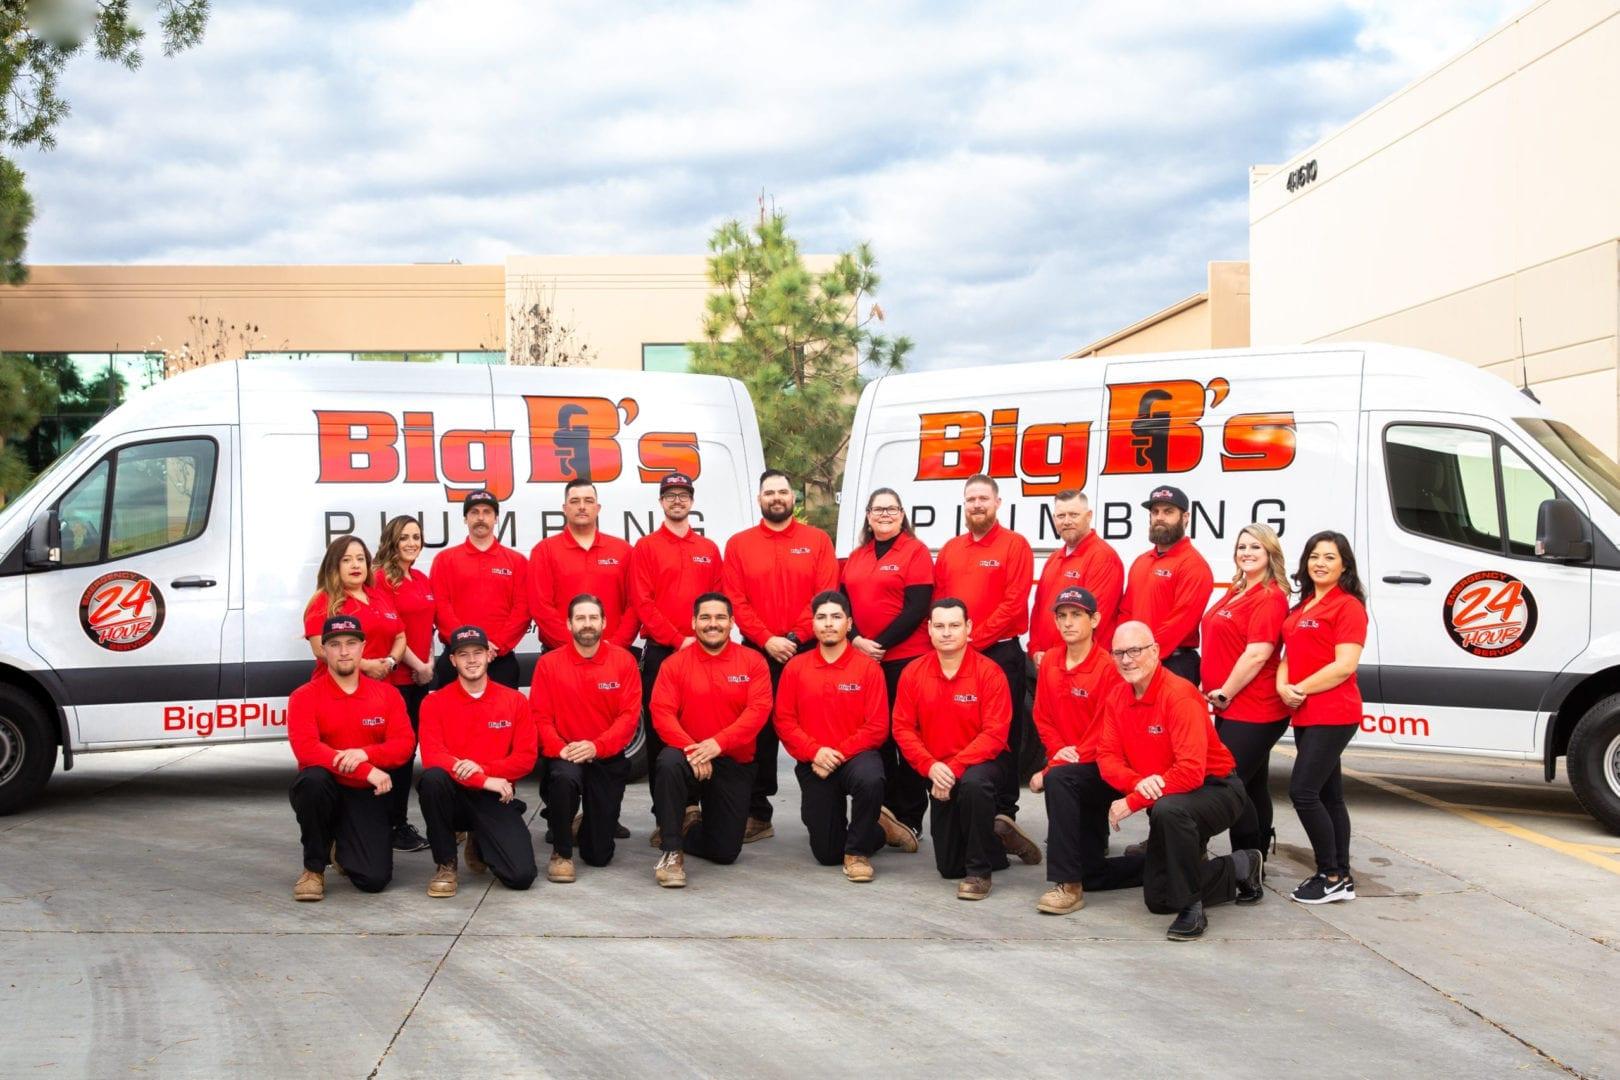 The Best Plumbing Company